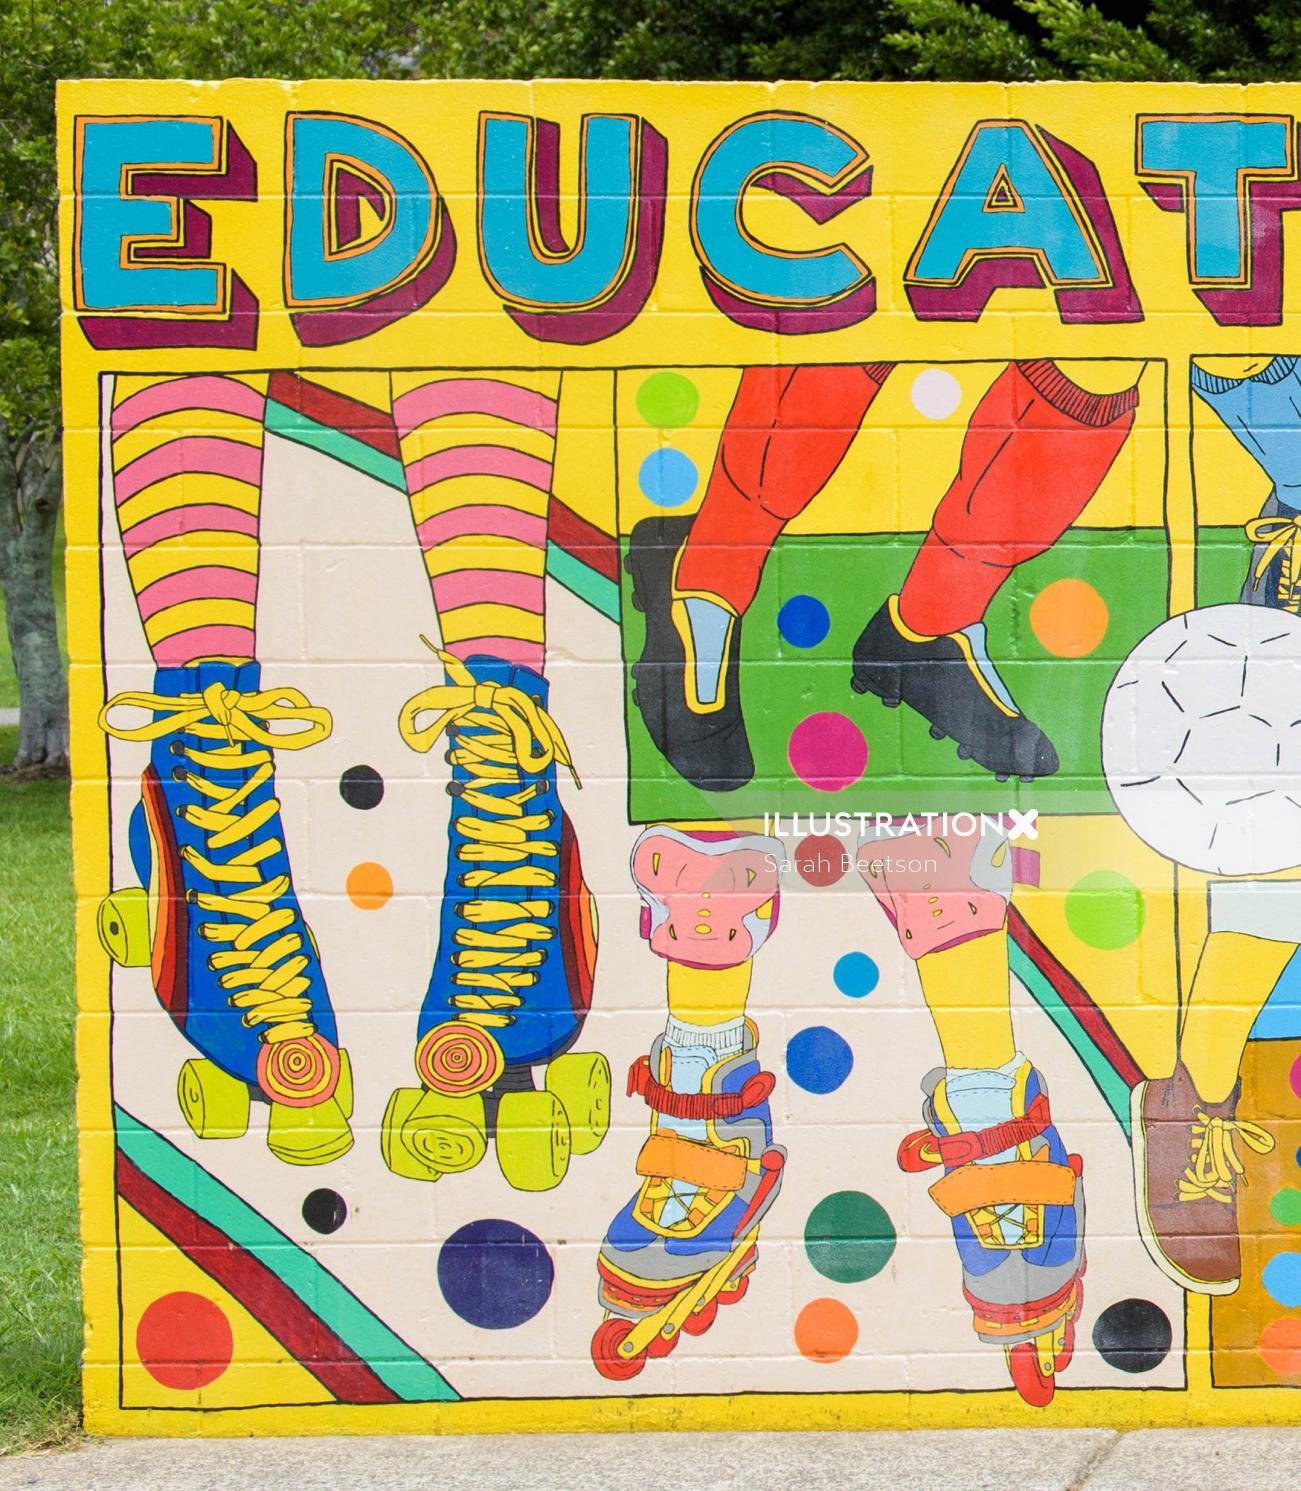 Educate Street art mural